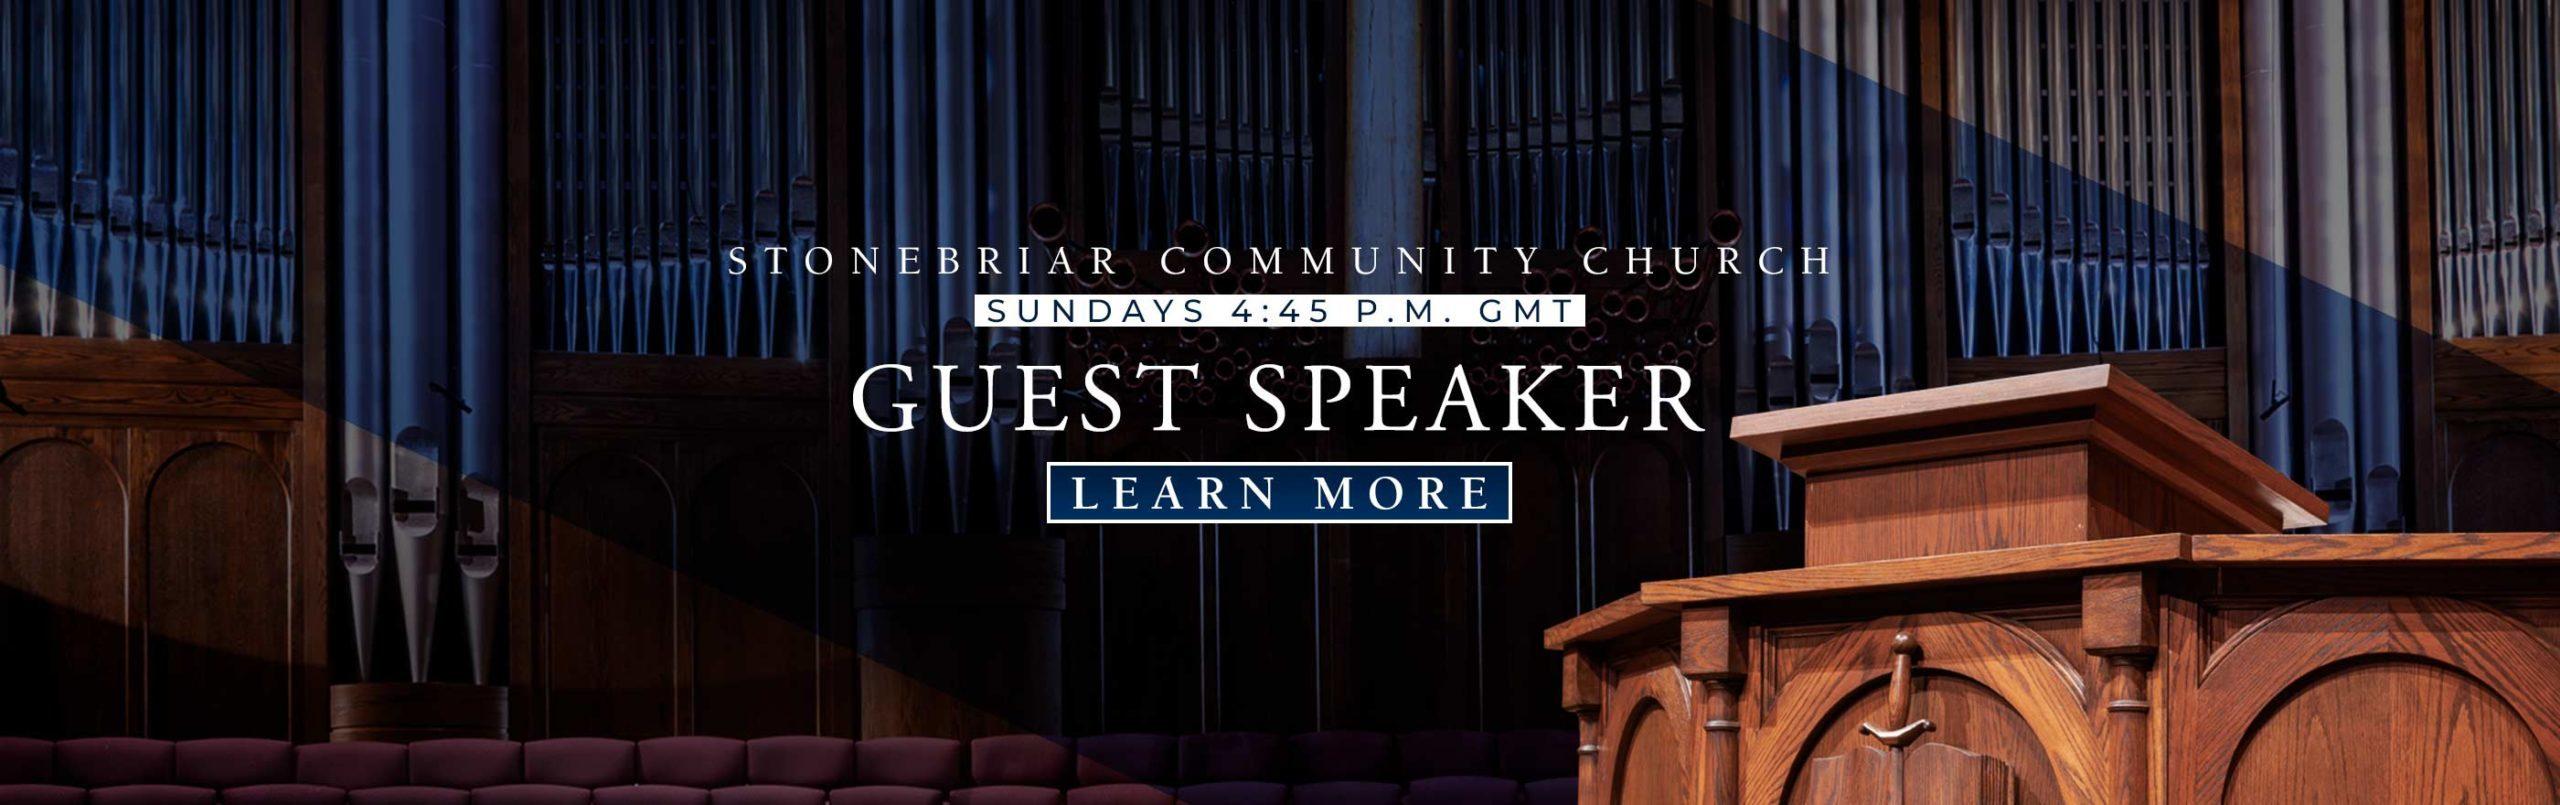 Stonebriar Guest Speaker